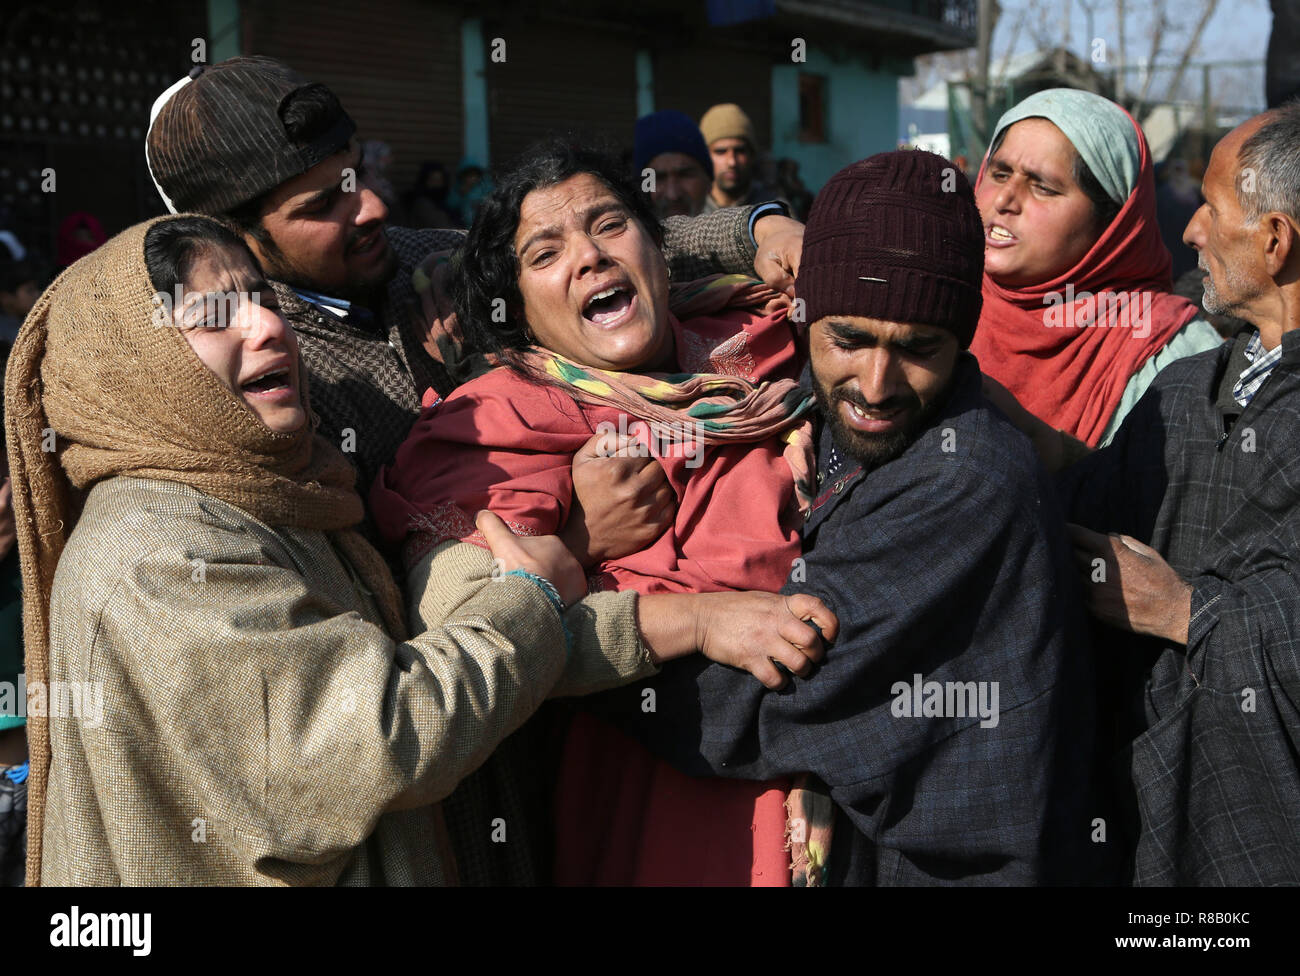 Killing Three Militants Stock Photos & Killing Three Militants Stock